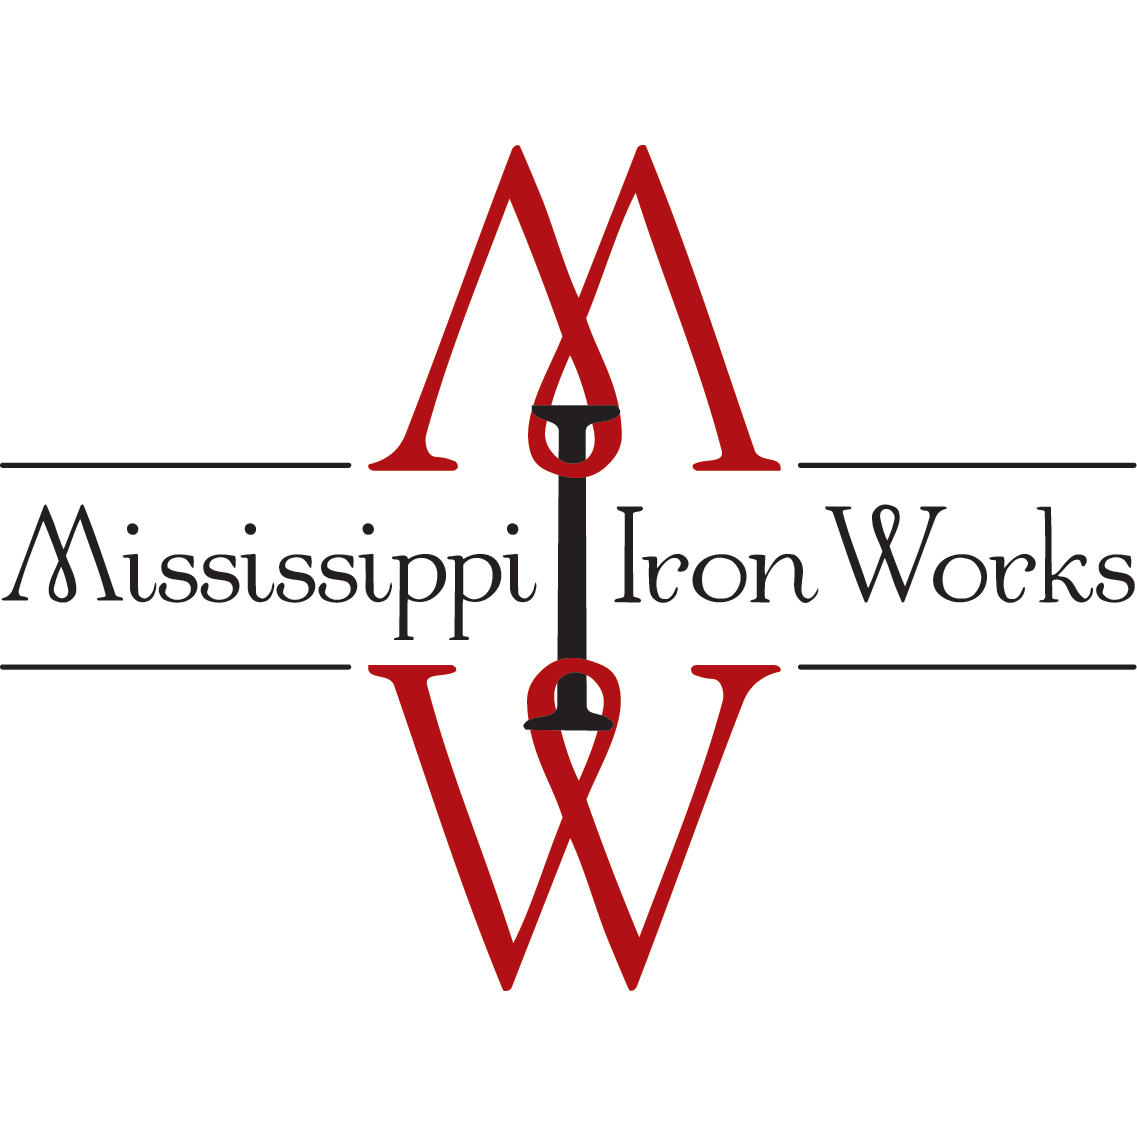 Mississippi Iron Works